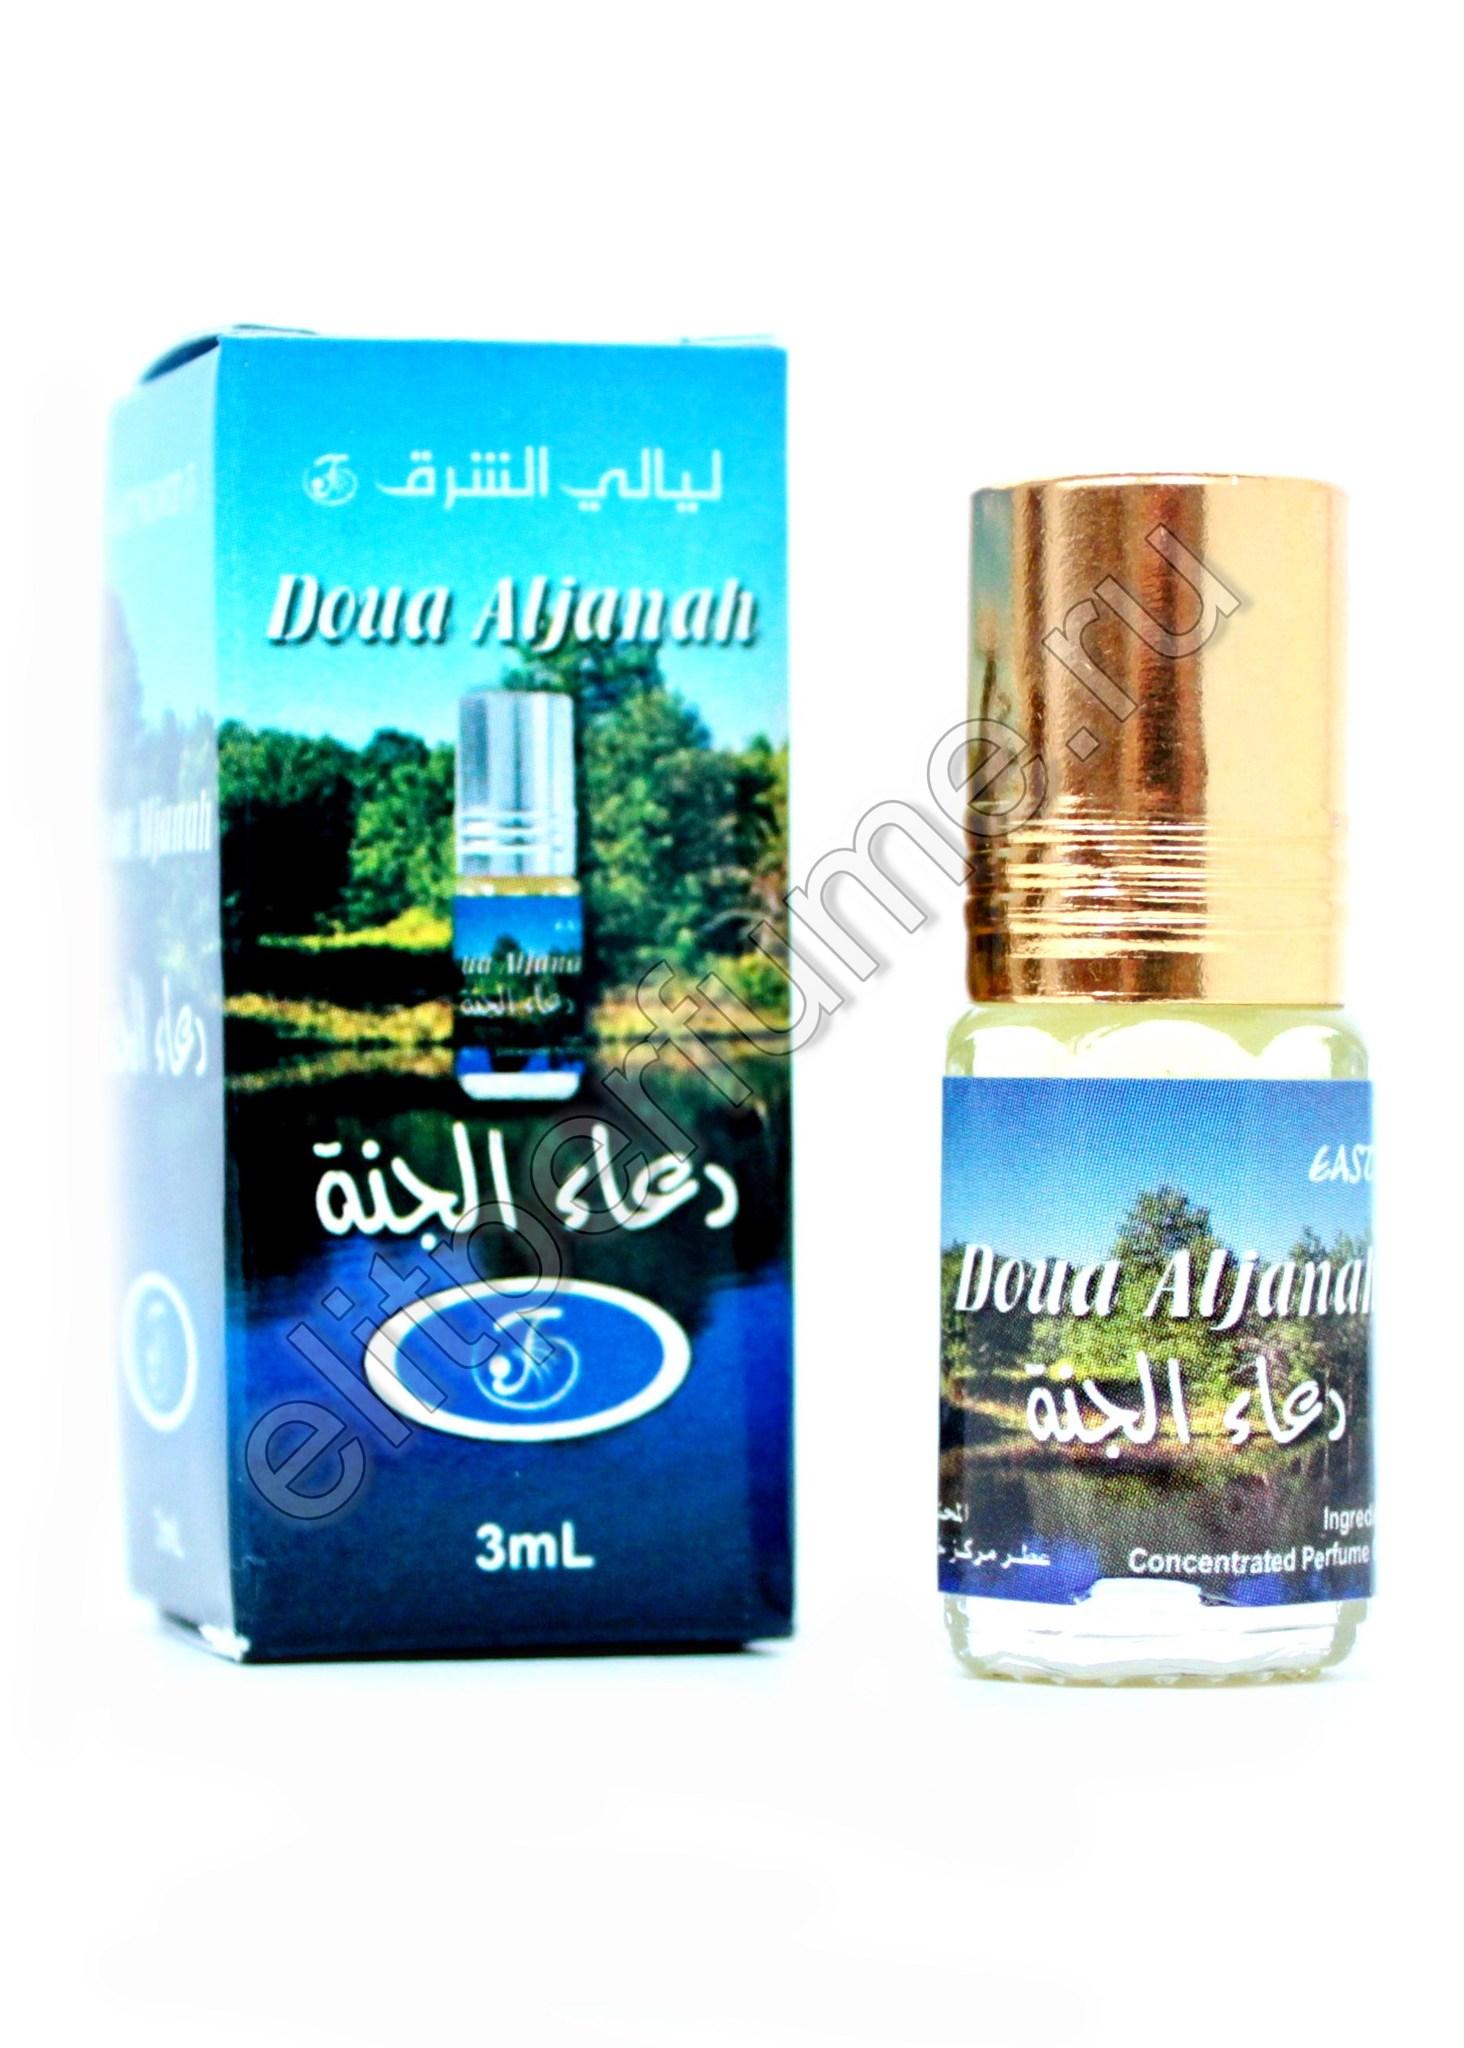 Doua Aljanah  Доу Аль Джанна 3 мл